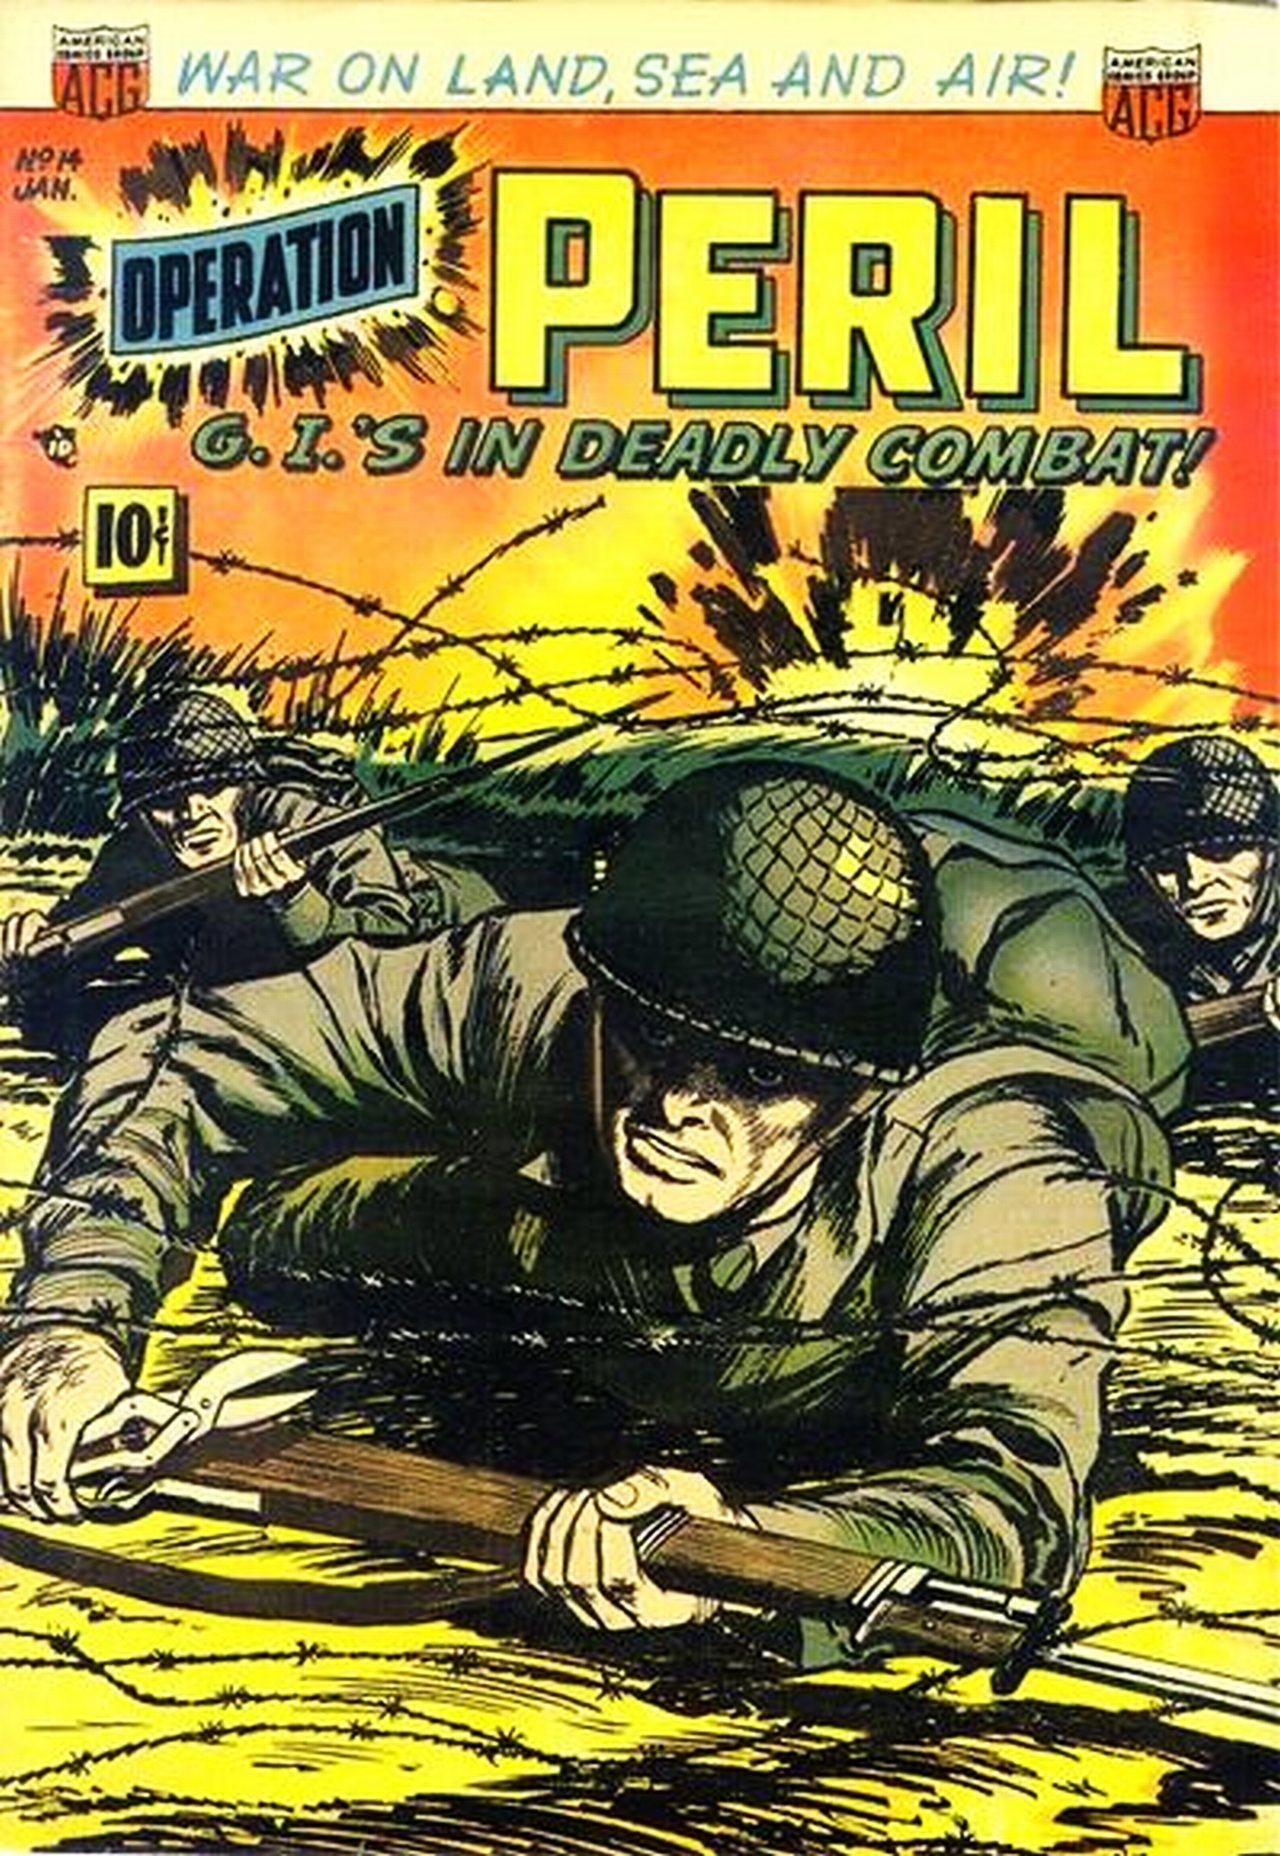 Operation: Peril Vol 1 14